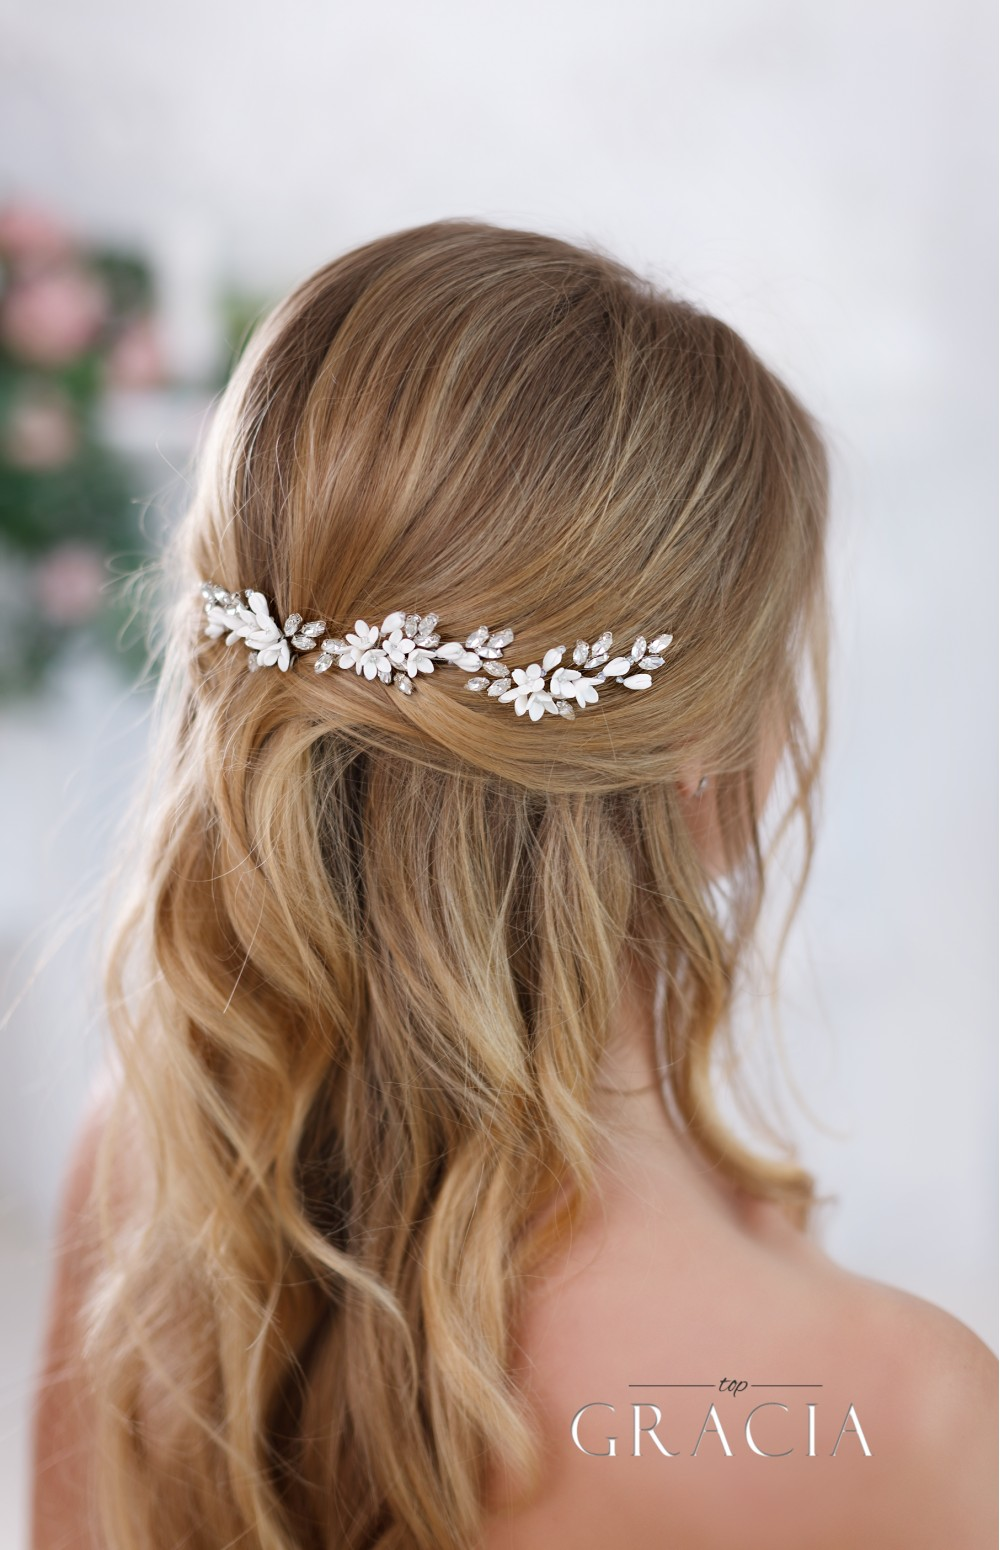 Blush Rhinestone Bobby Pins,Blush Bridal Bobby Pins,Blush Wedding Bobby Pins,Blush Crystal Bobby Pins,Blush Bridal Hair Piece,Blush Hair Pin